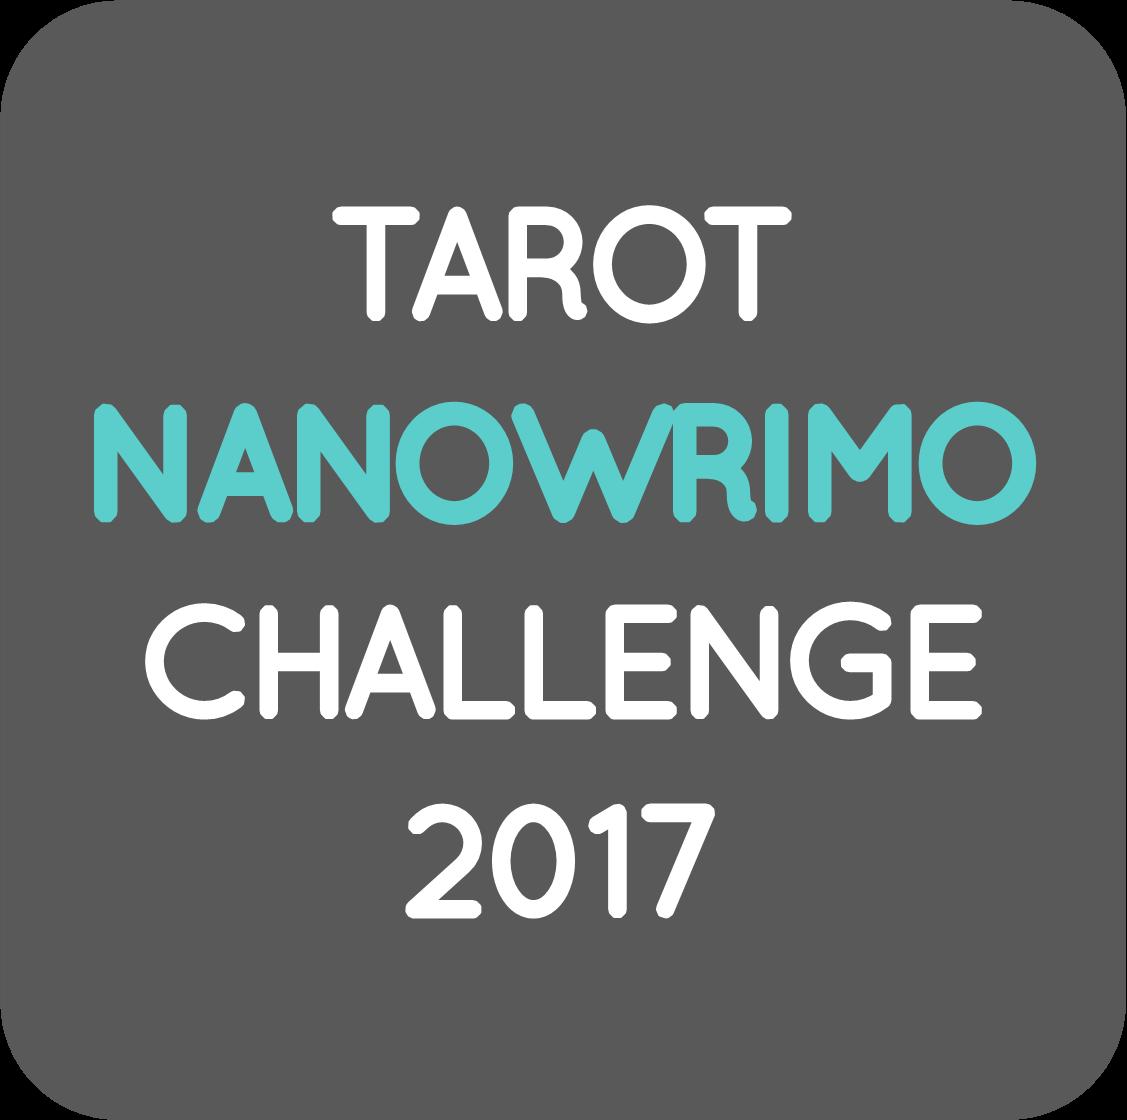 10-tarot nano challenge 2017 .png